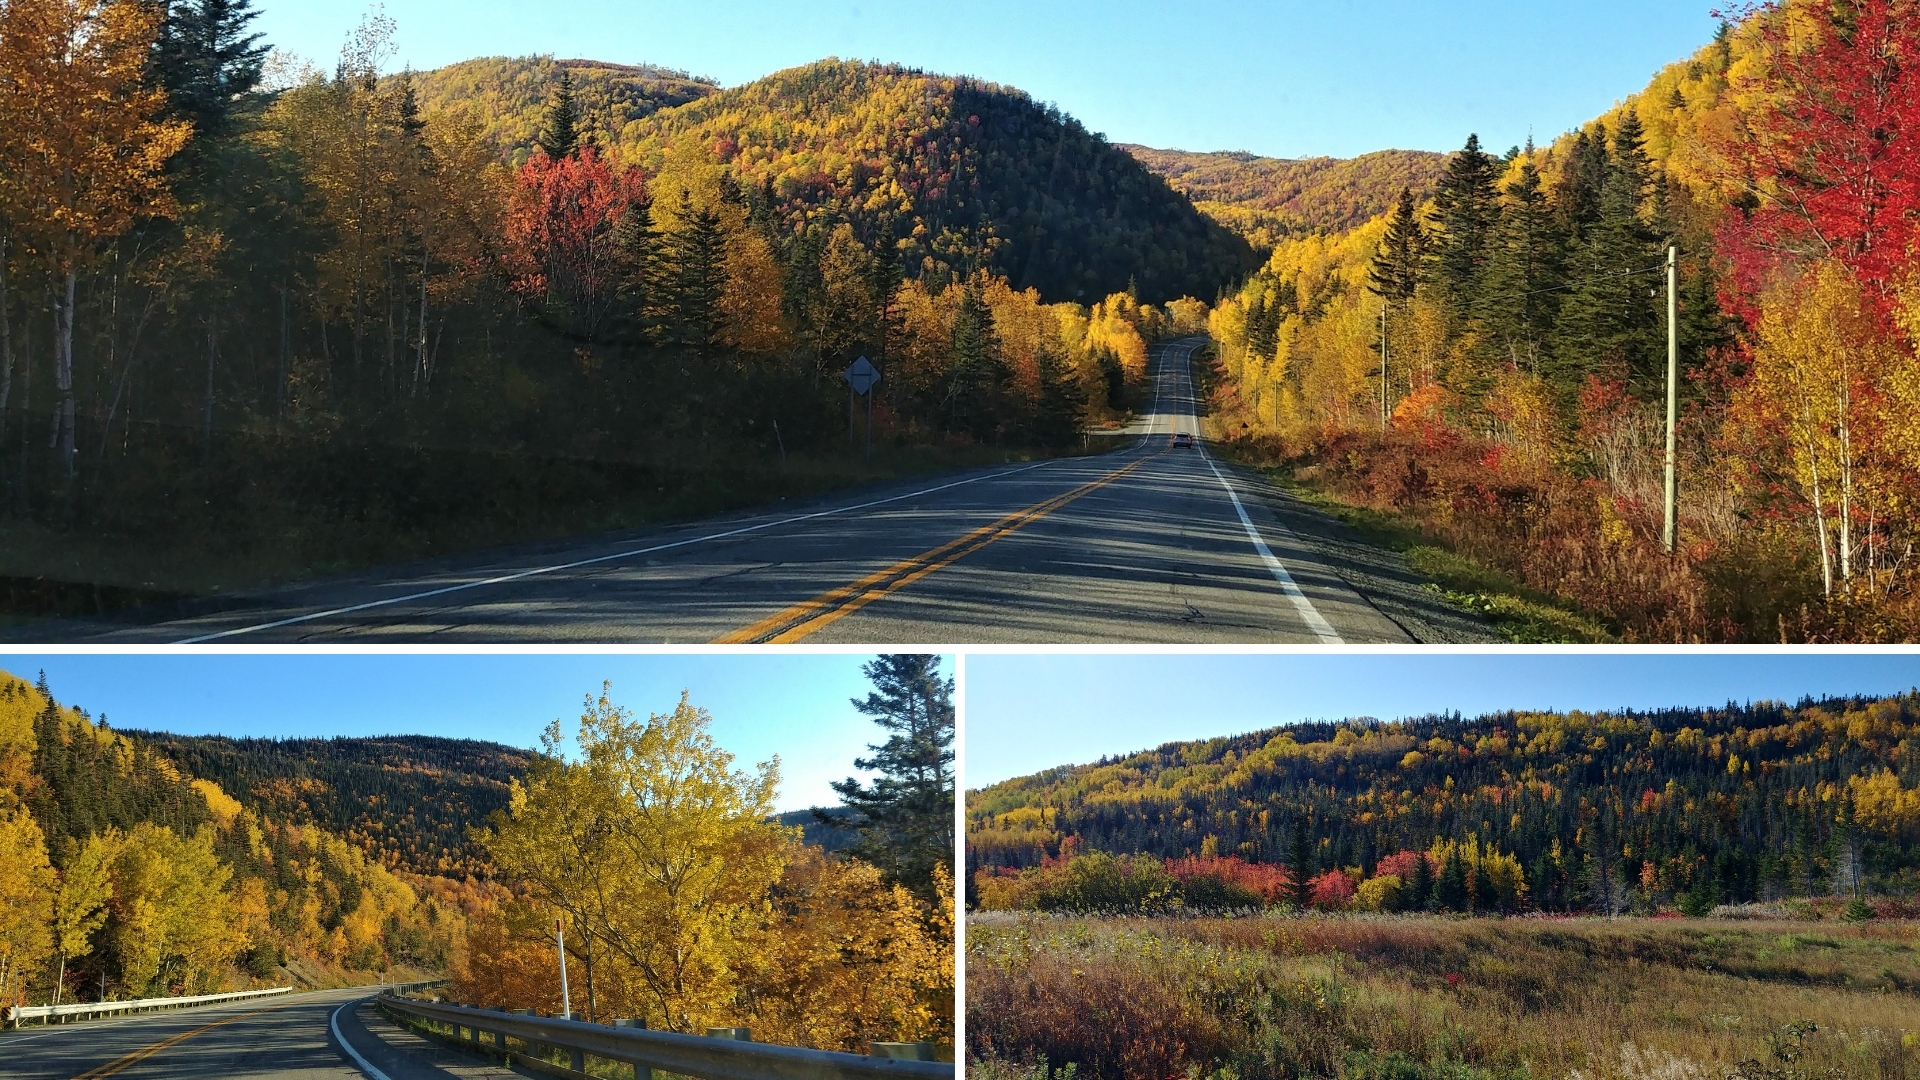 route 132 gaspesie automne blog voyage canada road-trip arpenter le chemin